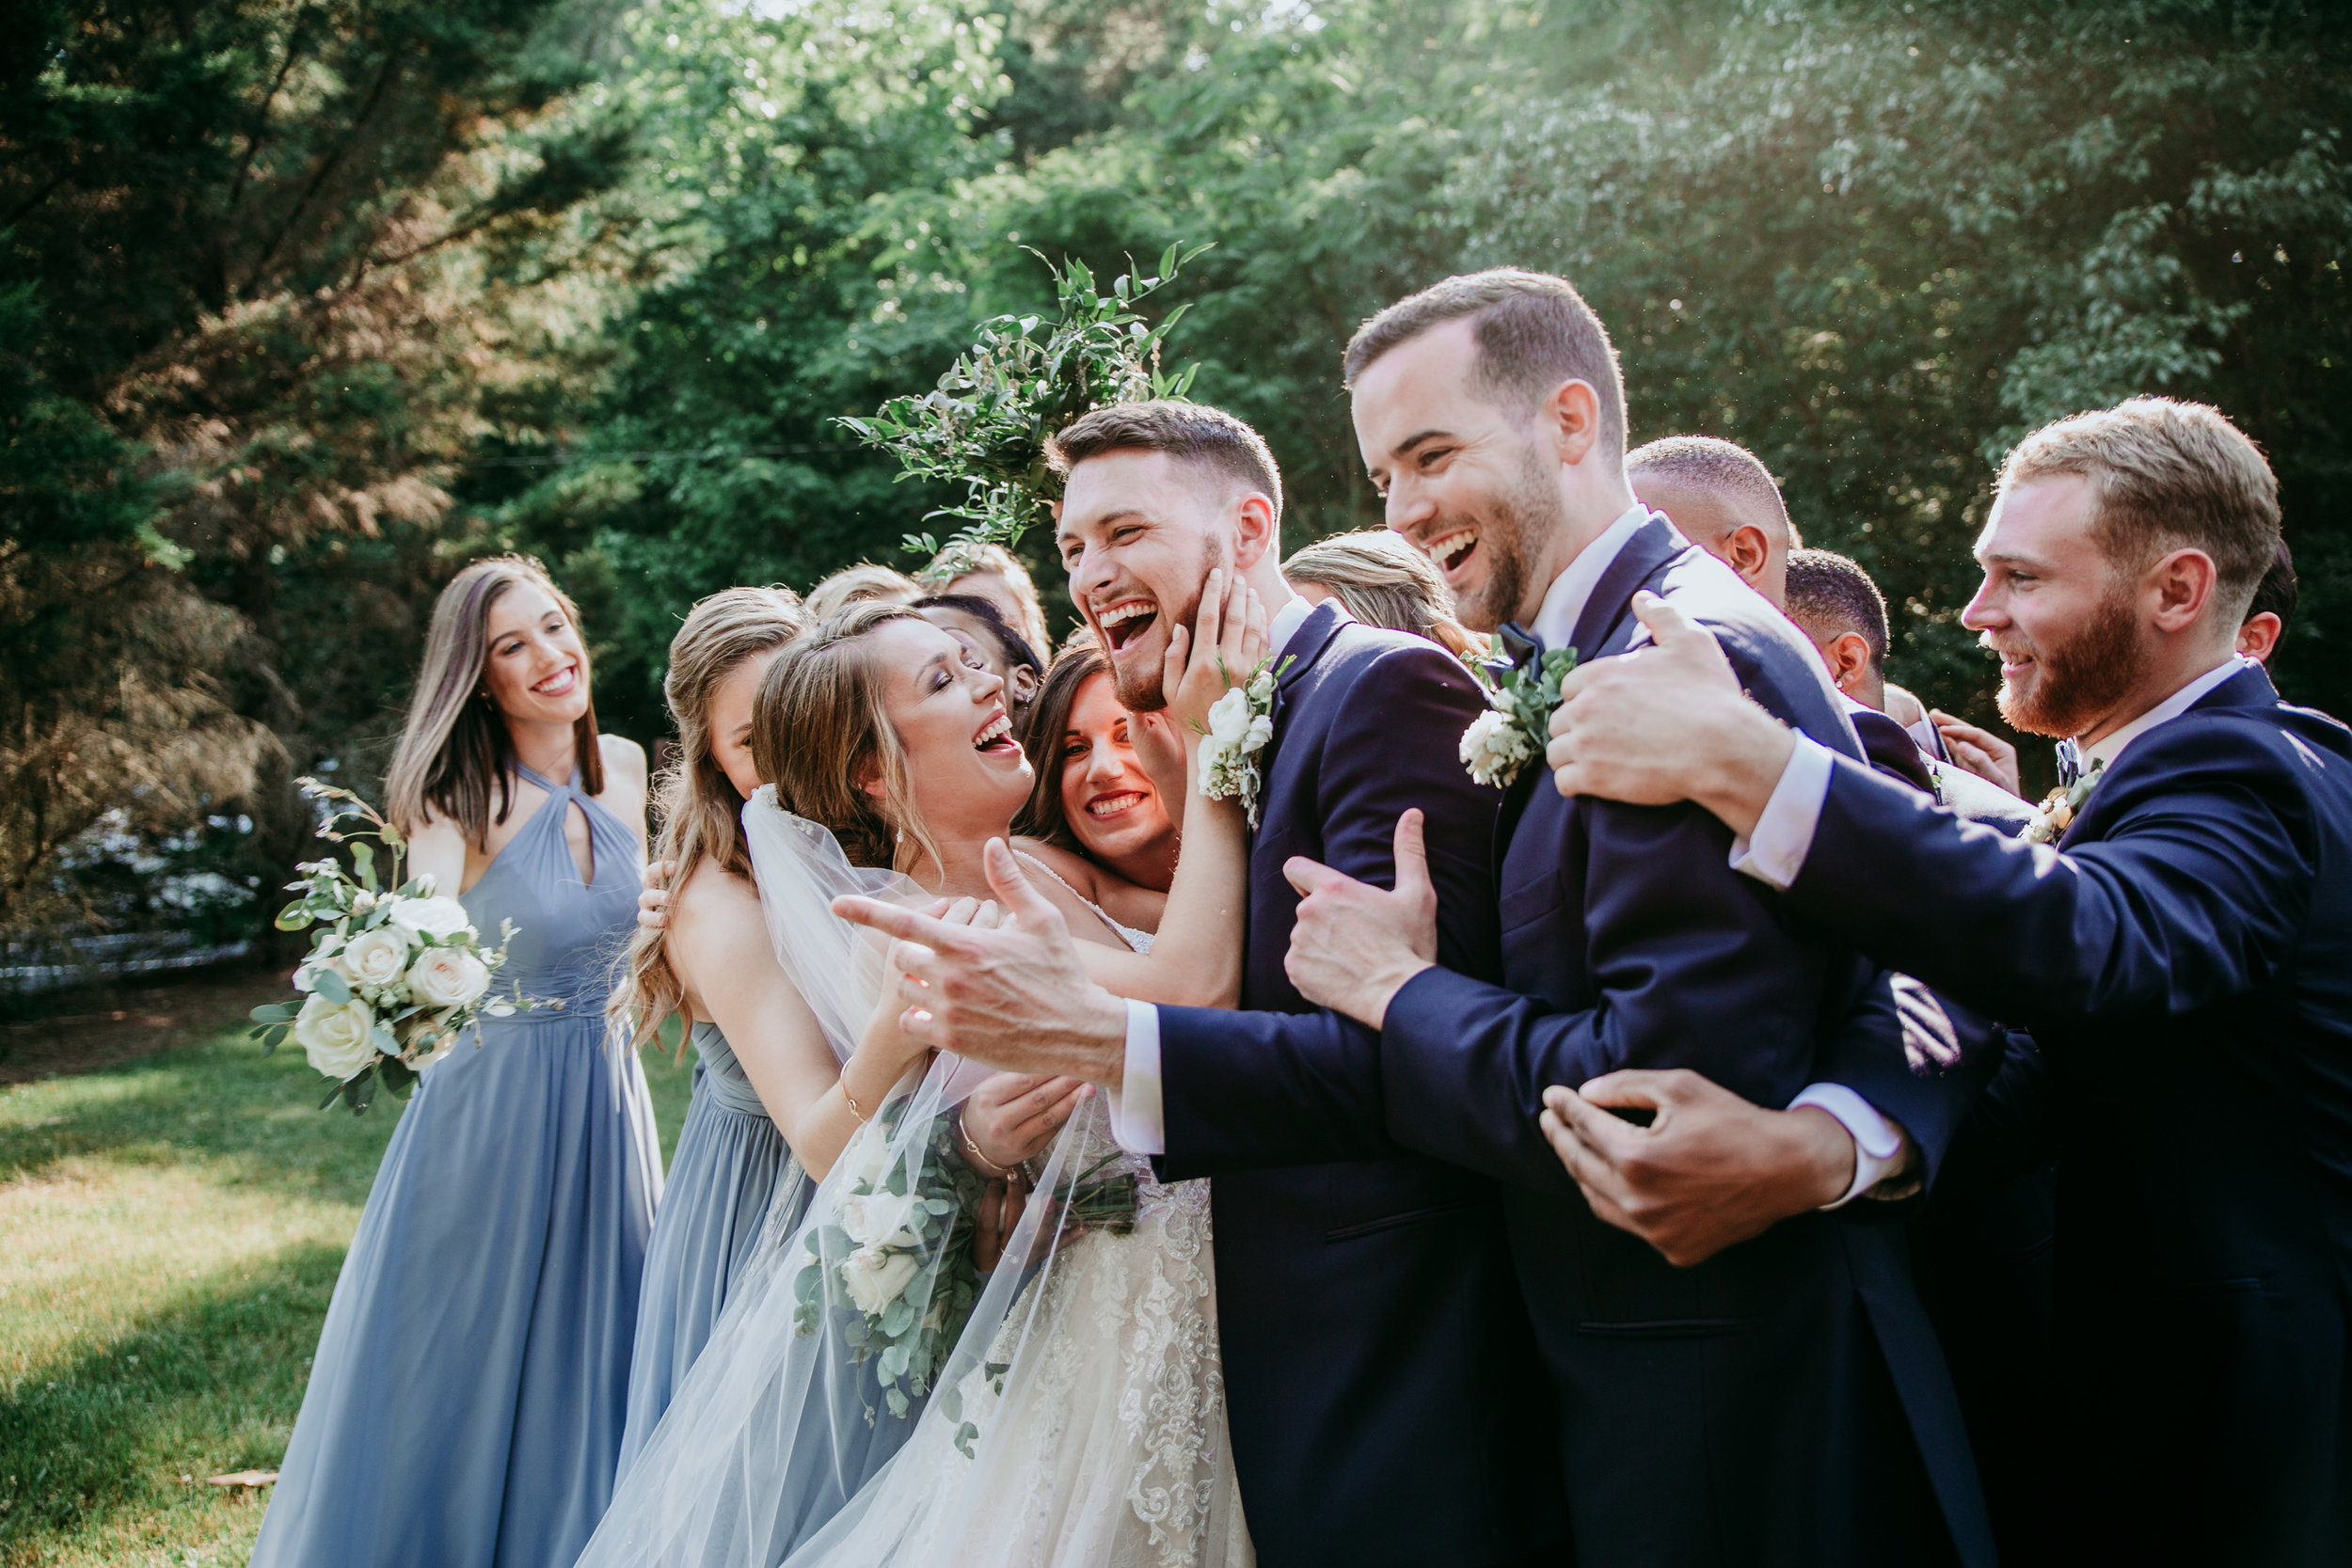 wedding-photo-ideas-for-bride-and-groom.jpg